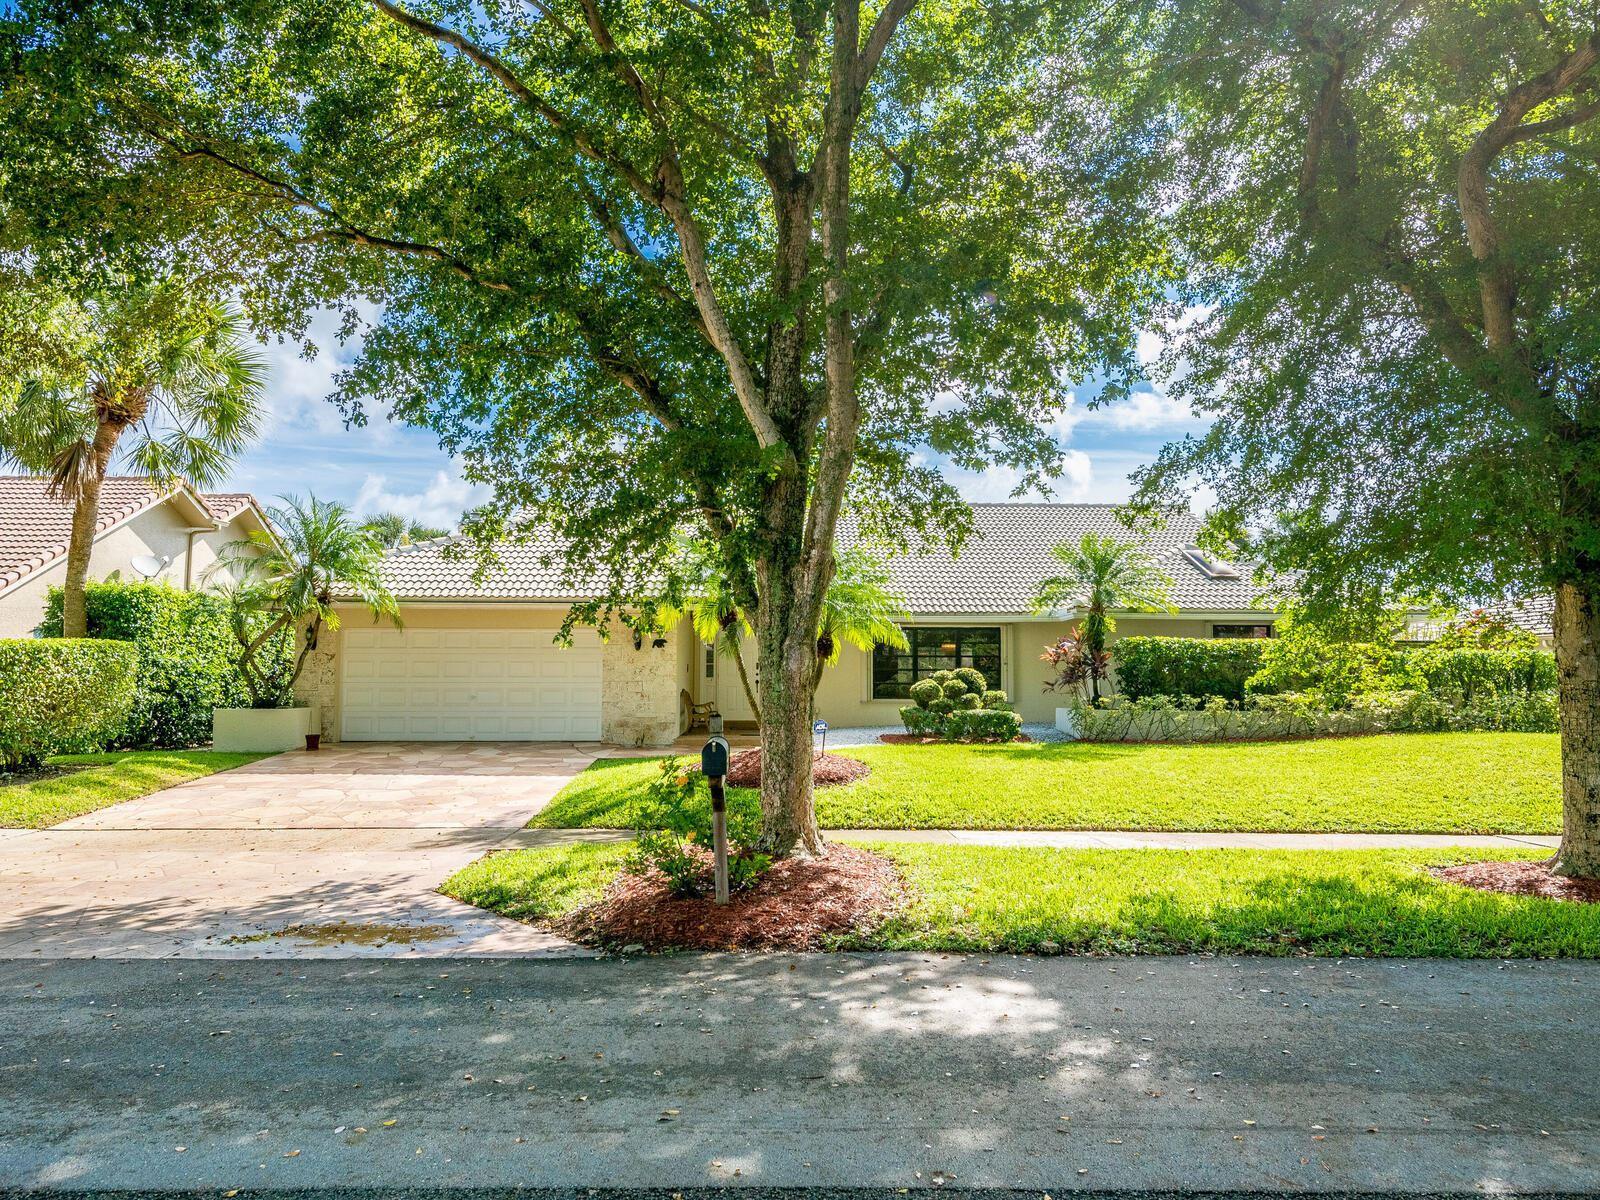 264 Woodlake Circle, Deerfield Beach, FL 33442 - #: RX-10664369